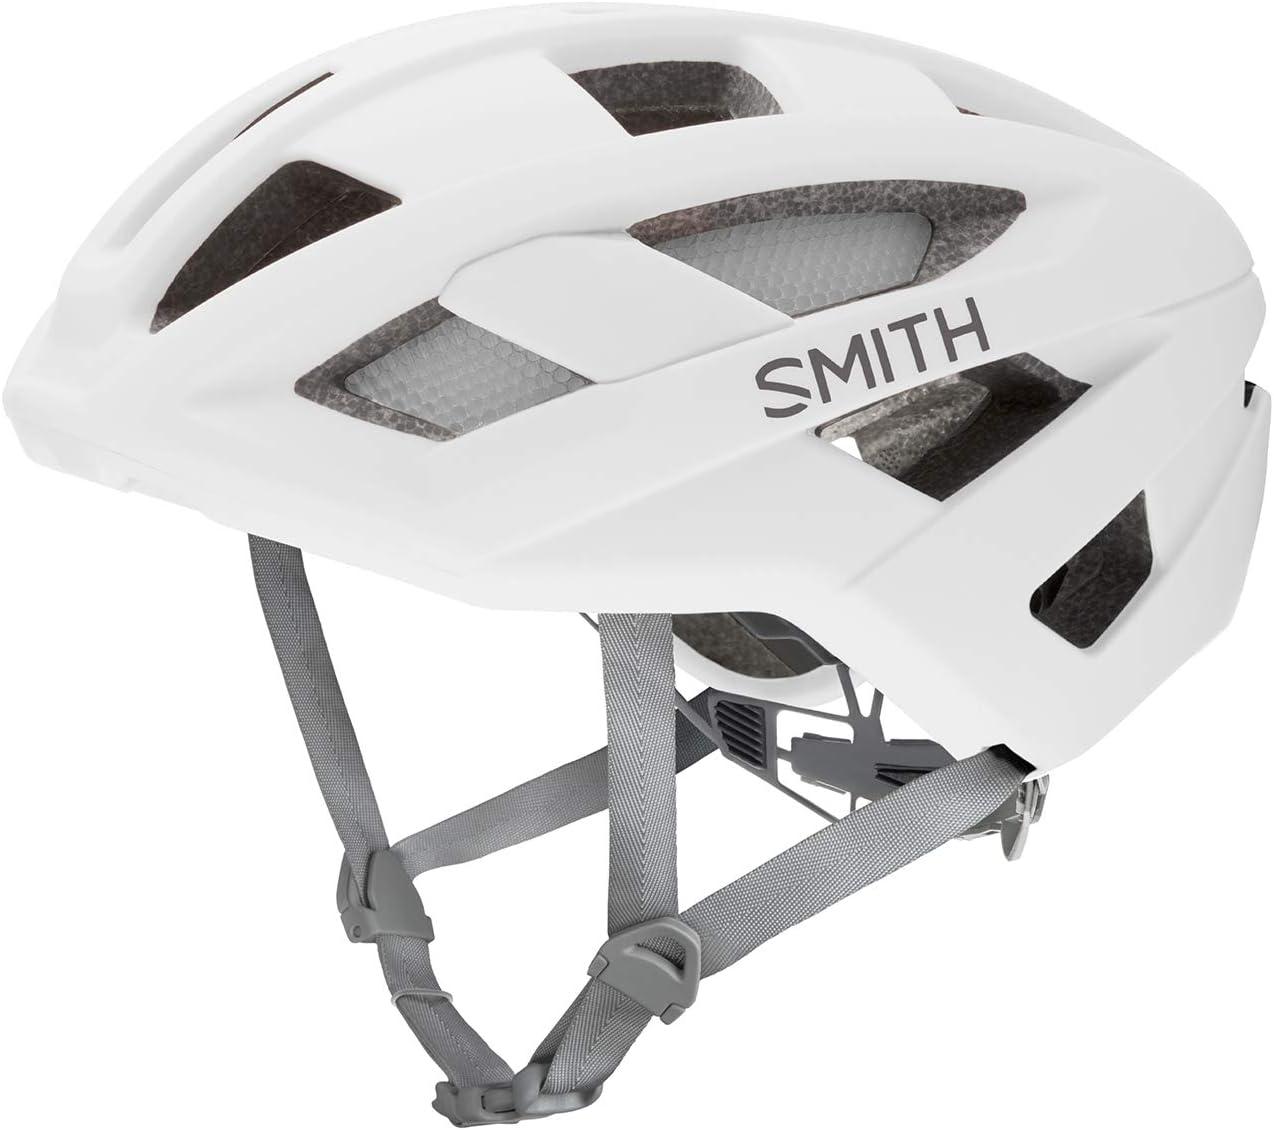 Small or Medium  BNIB SMITH ROUTE MIPS Road Cycle Bike Helmet Matte Black